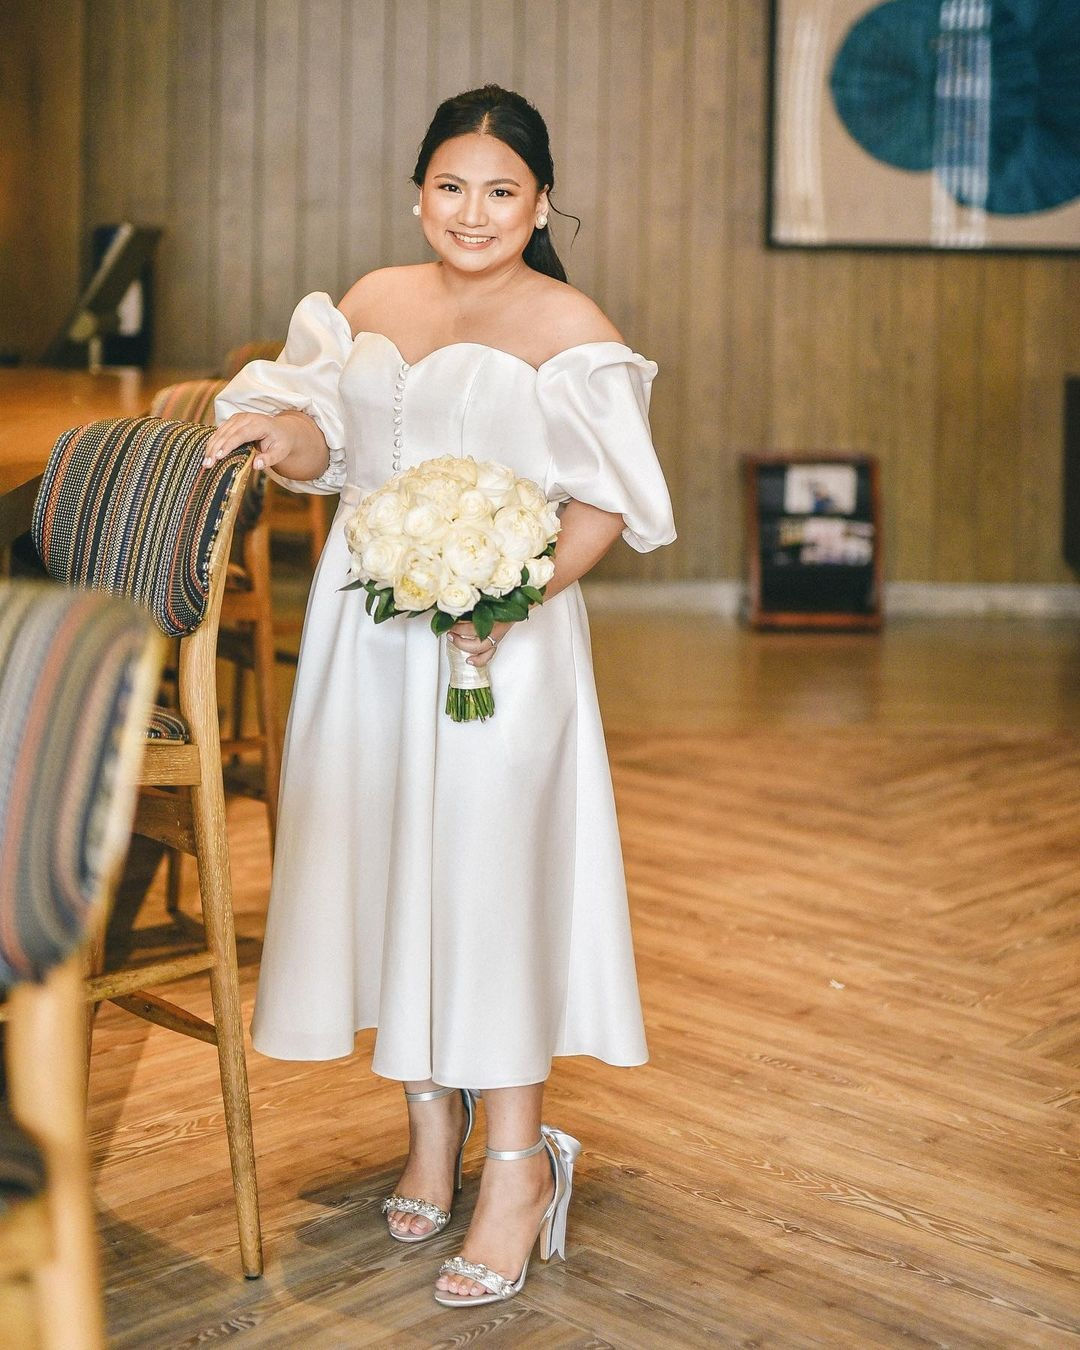 Rosenthal Tee Wedding Gown